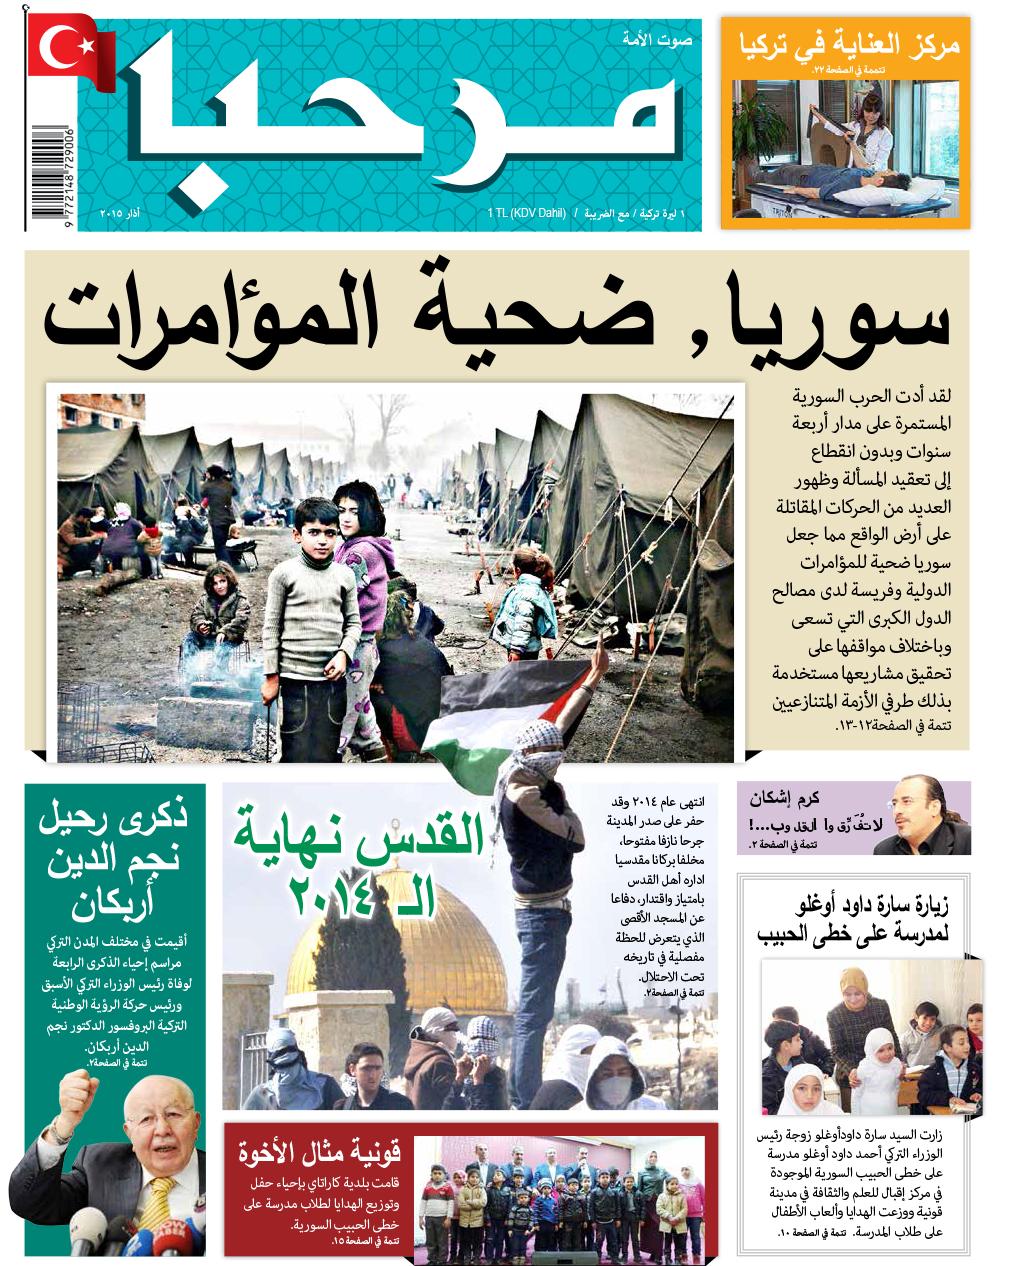 Merhaba-Arabca-Sayı:10-Mart2015